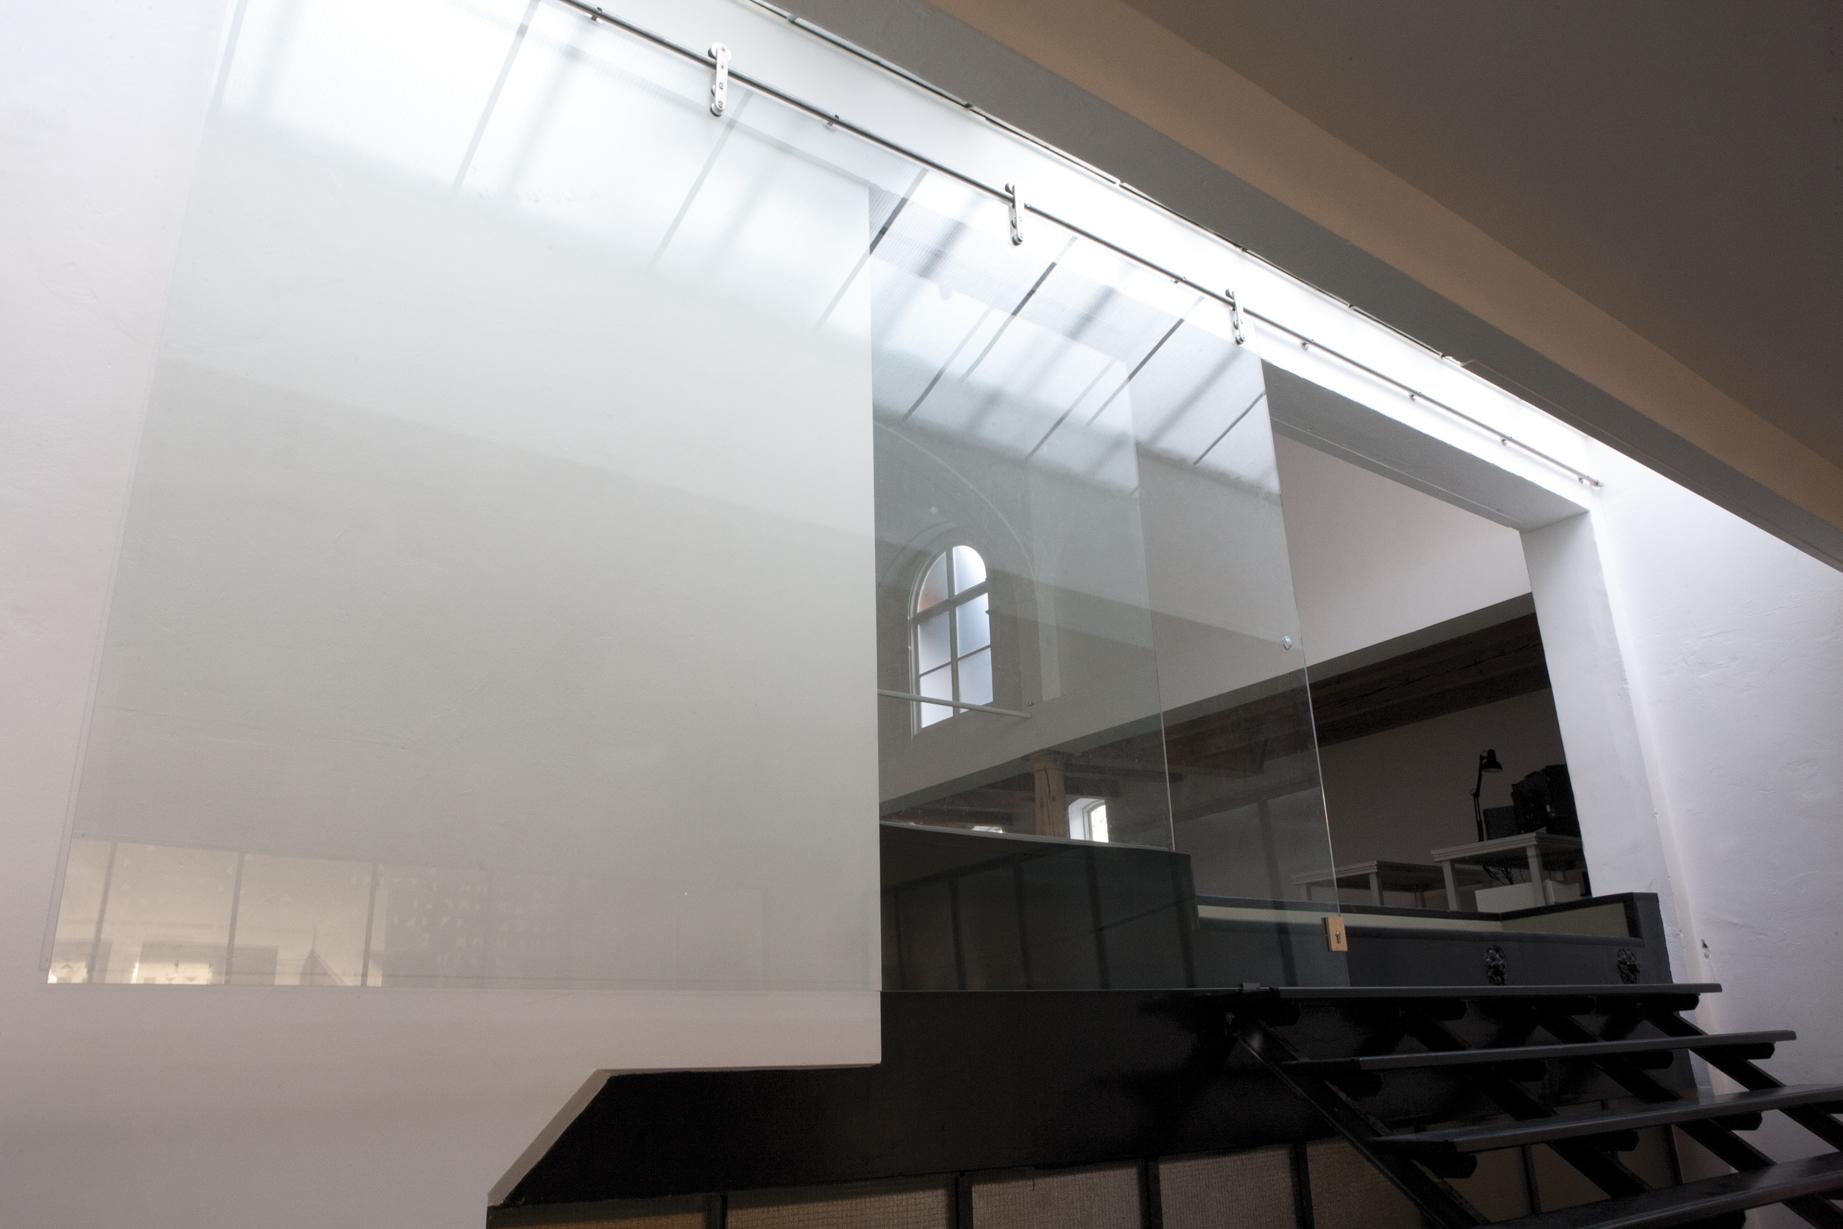 Schuifdeur van 3.30 breed van glas